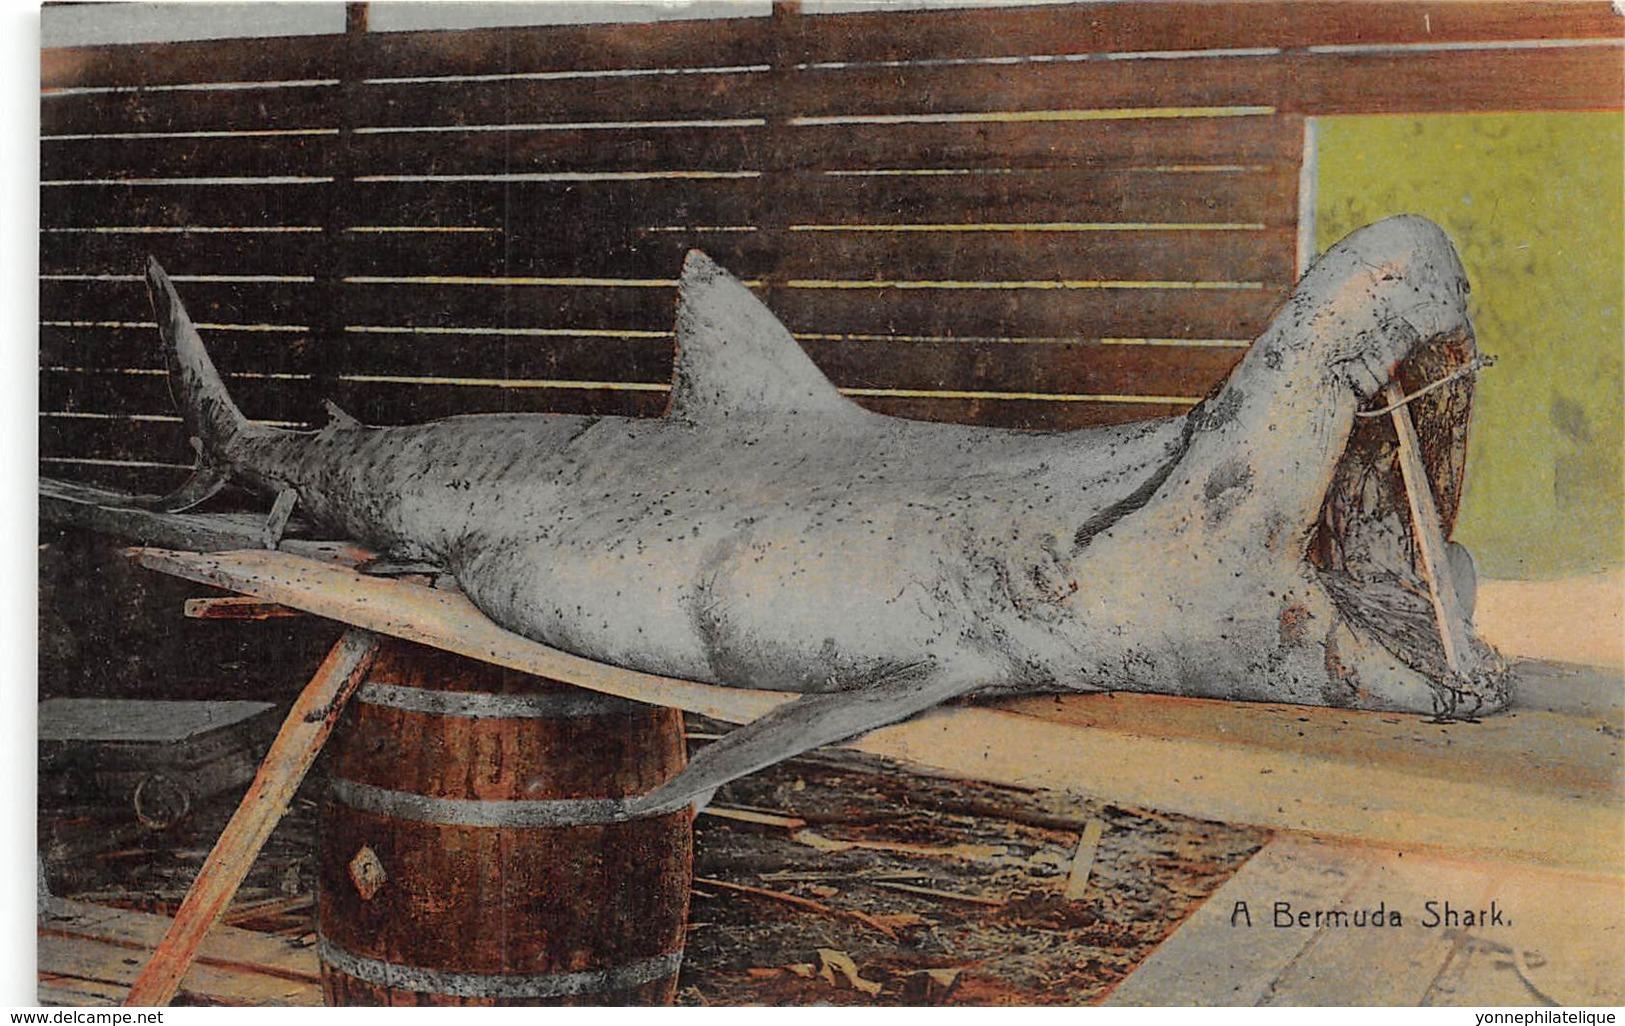 Bermuda / 09 - A Bermuda Shark - Bermudes